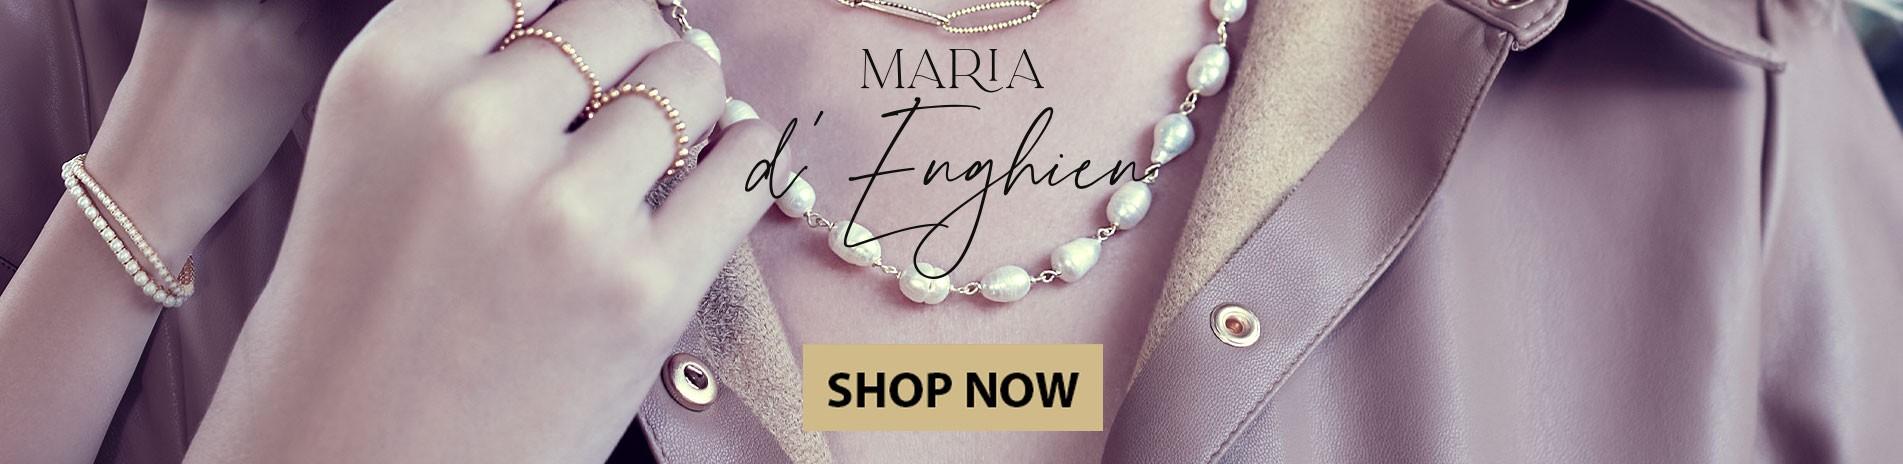 Maria D'Enghien by Le Carose